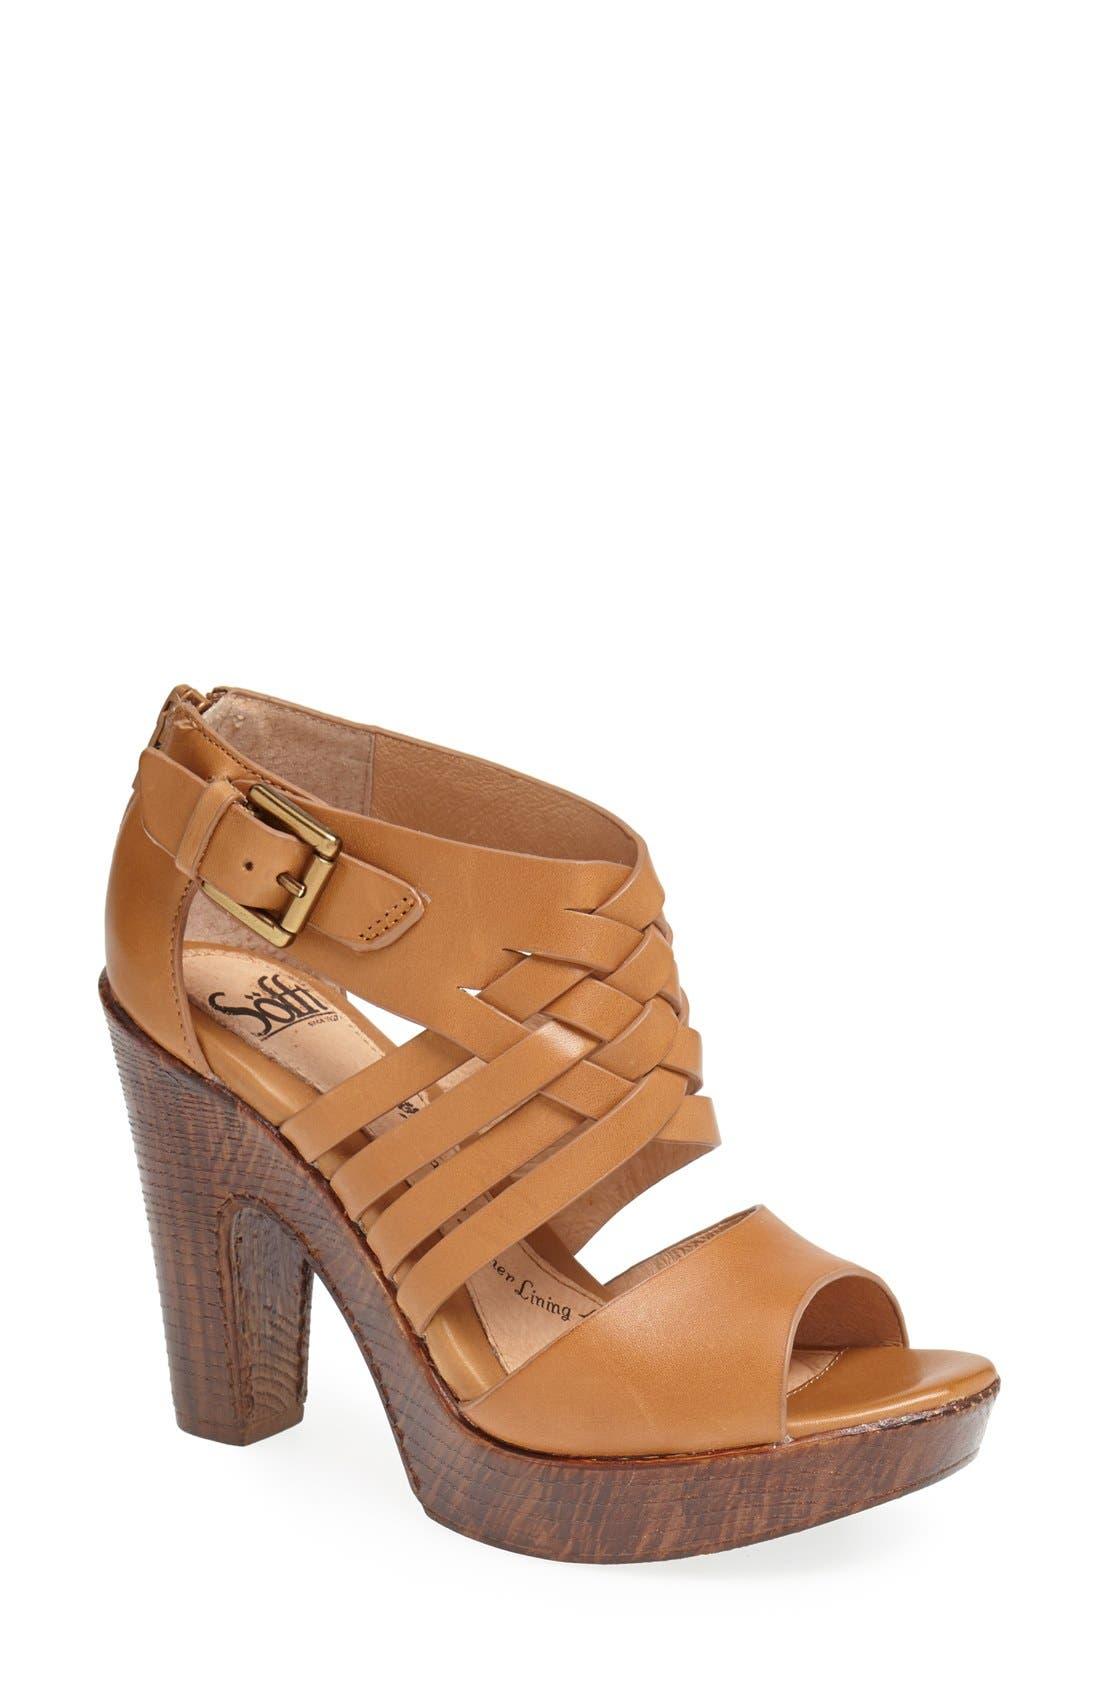 'Ohanna' Leather Sandal,                             Main thumbnail 1, color,                             Luggage